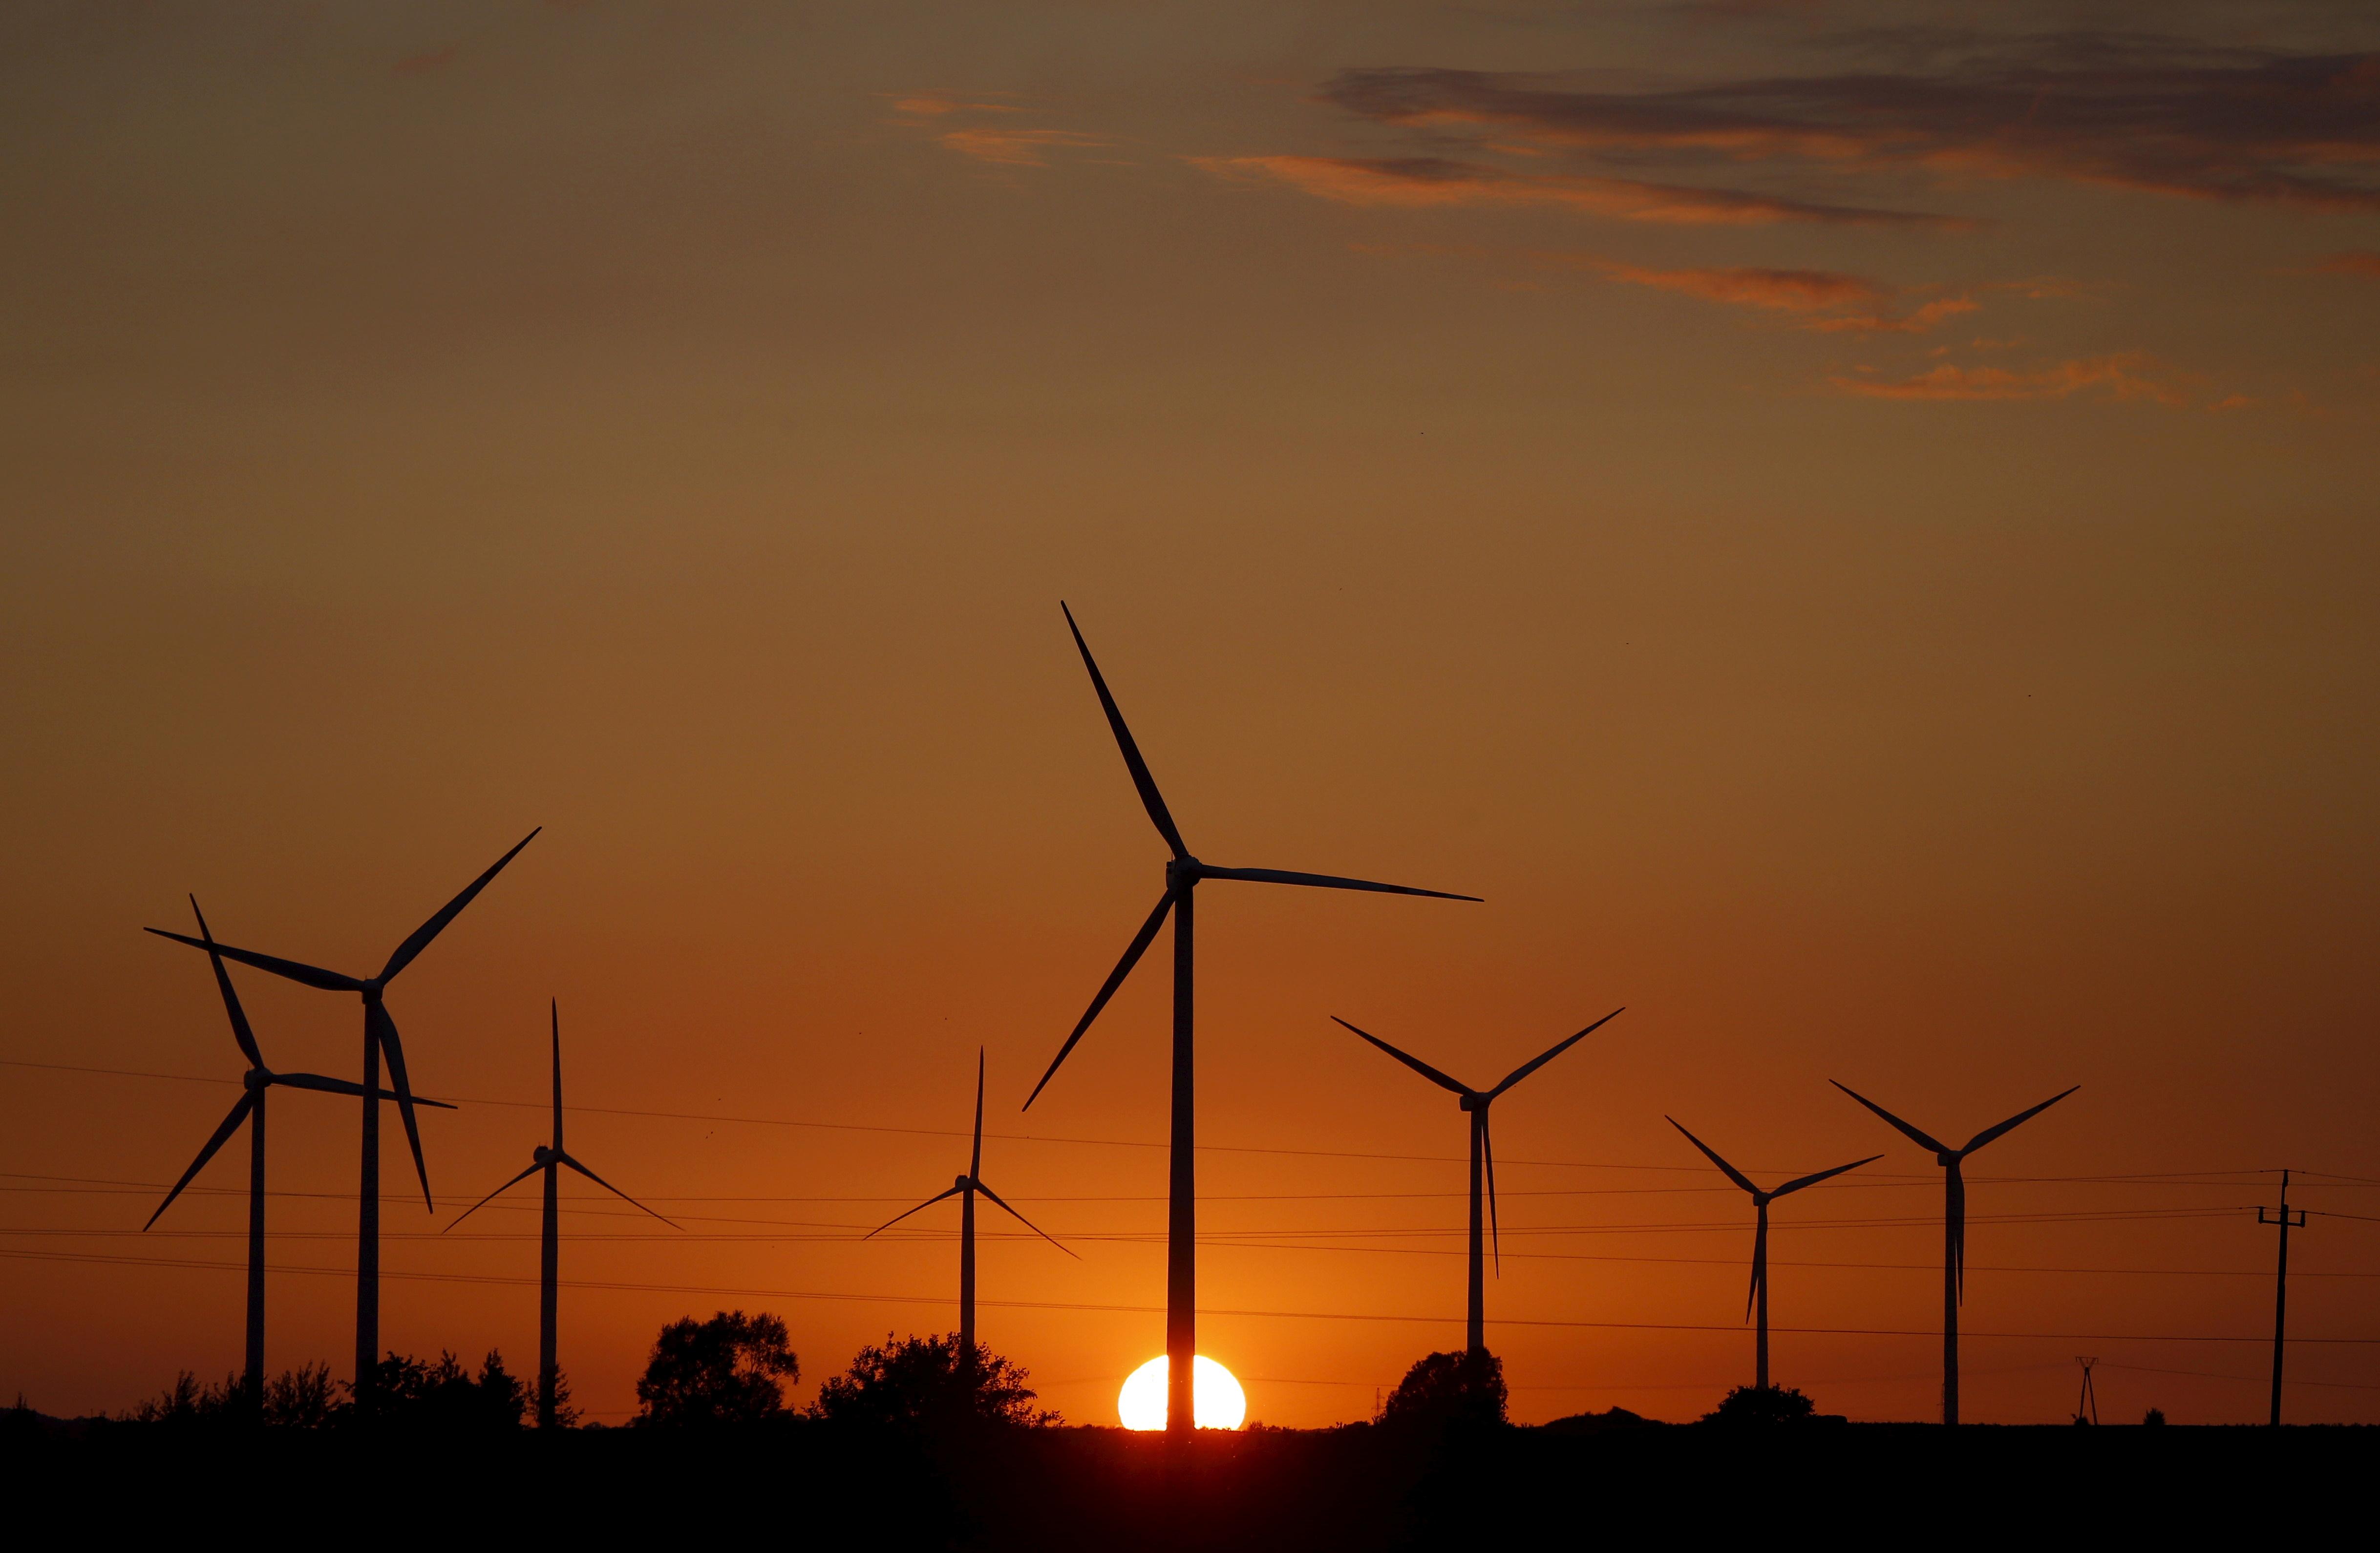 A sunset is seen through a wind farm near Puck, northern Poland, July 22, 2015. REUTERS/Kacper Pempel